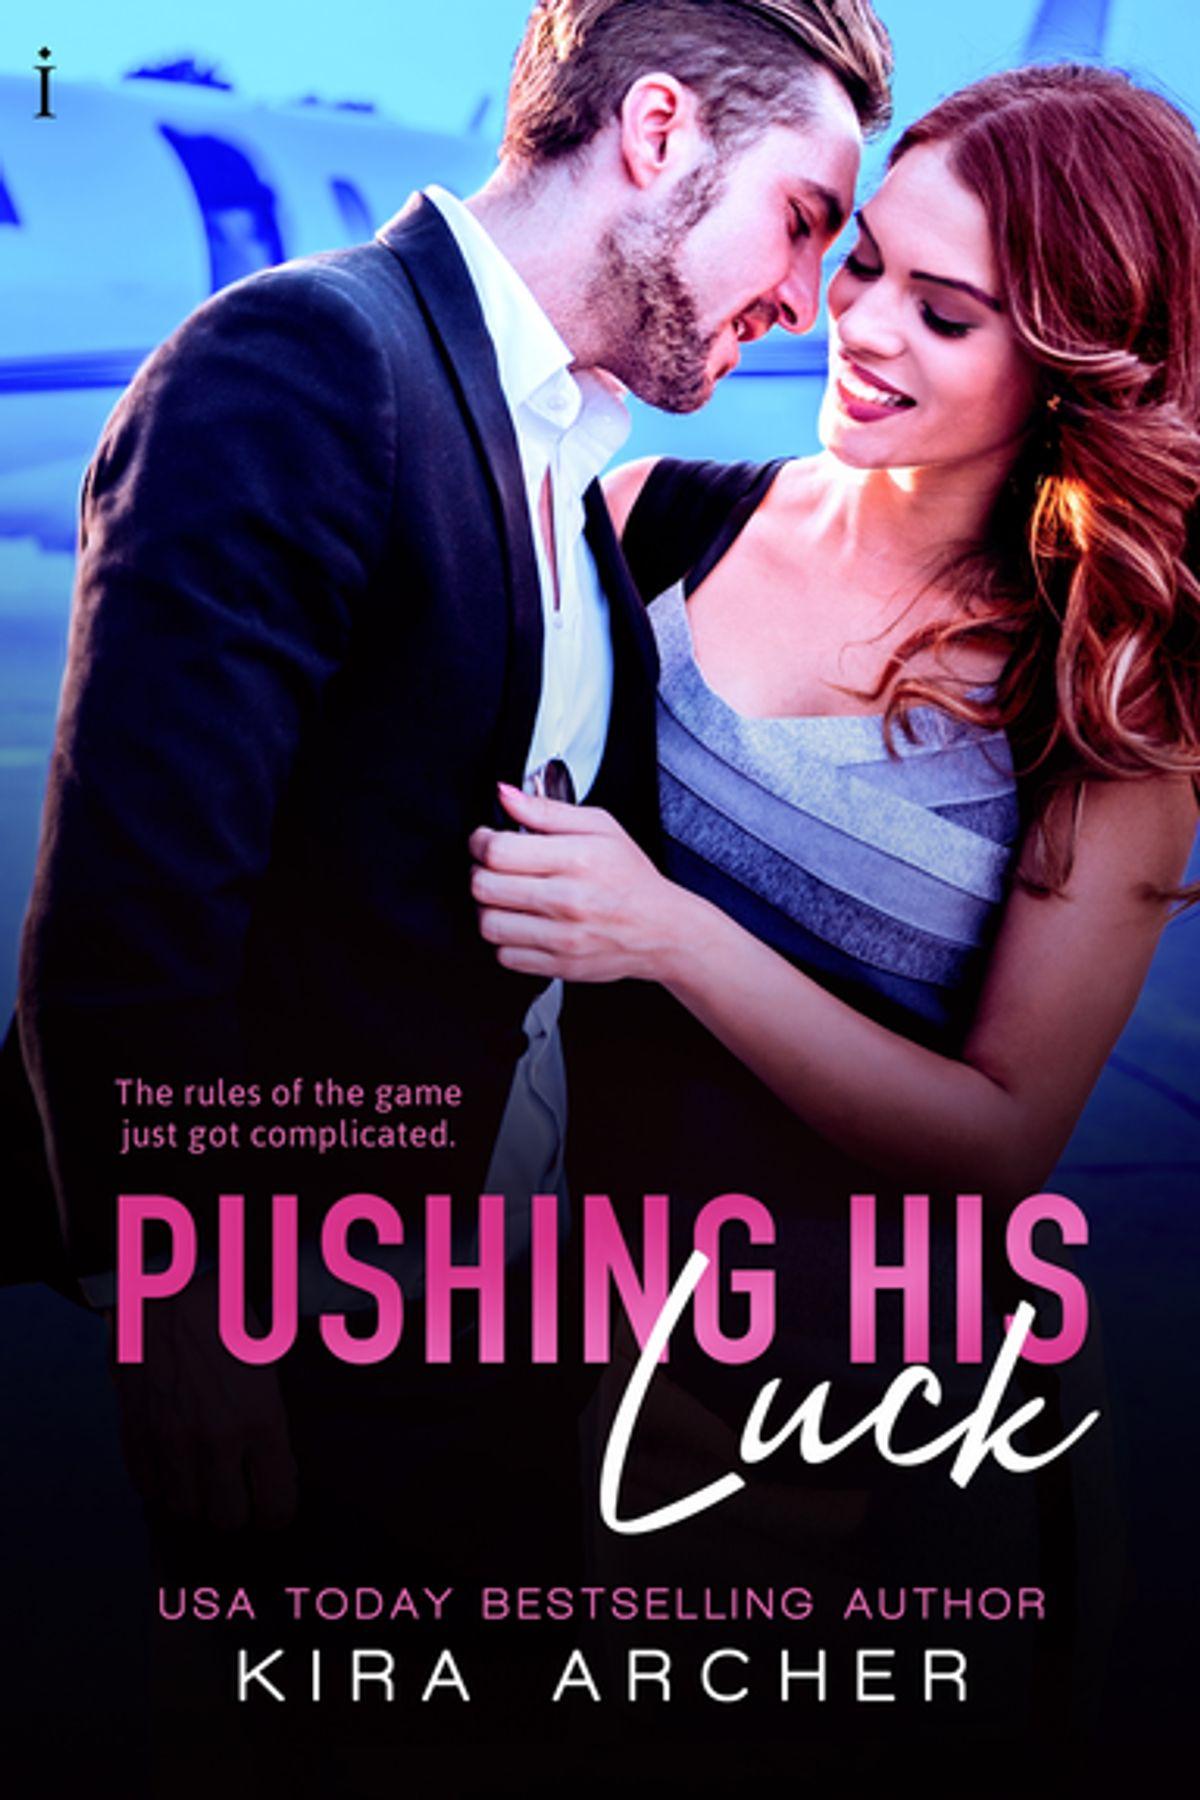 Pushing His Luck (Winning The Billionaire #4) by Kira Archer